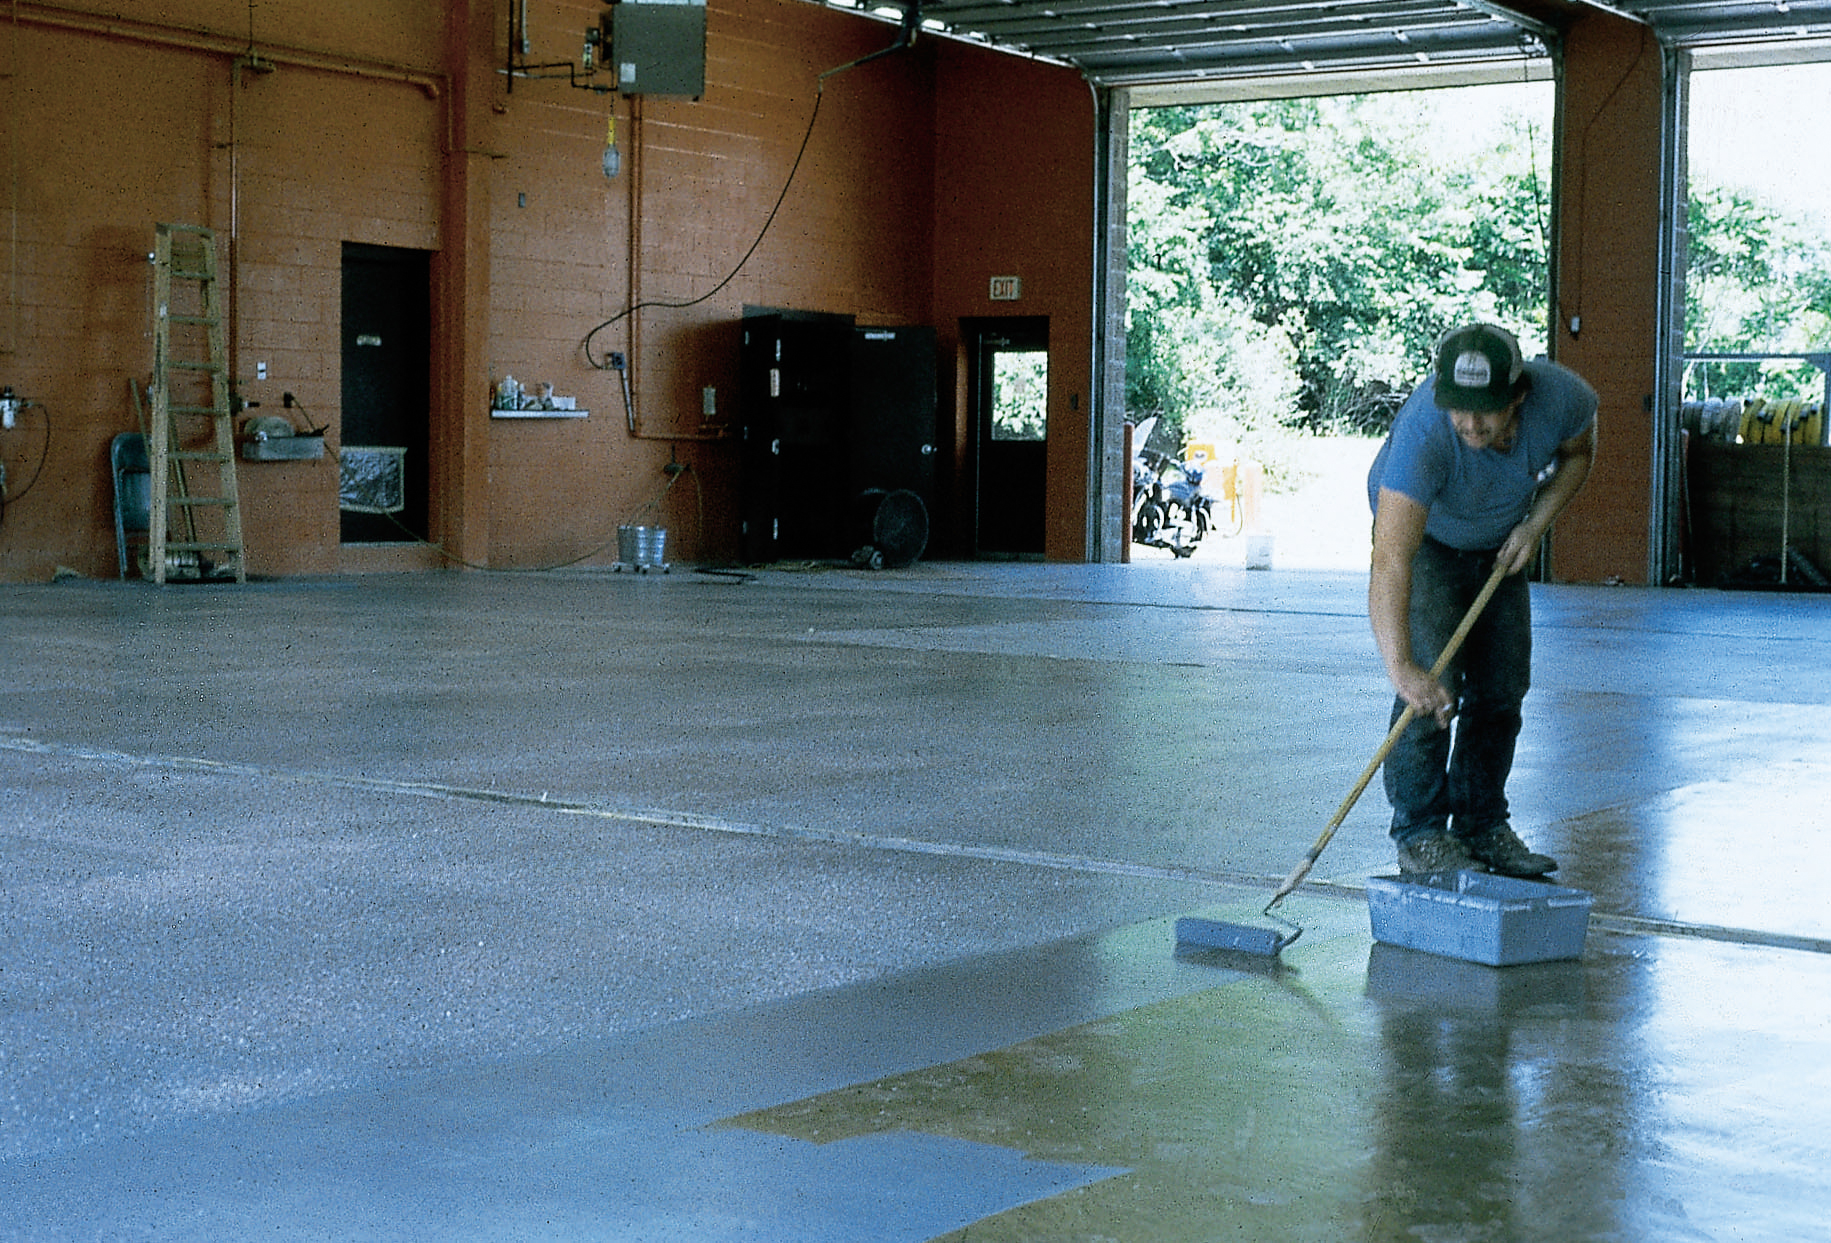 Non Toxic Concrete Sealer | Sealers for Floors - No Toxicity